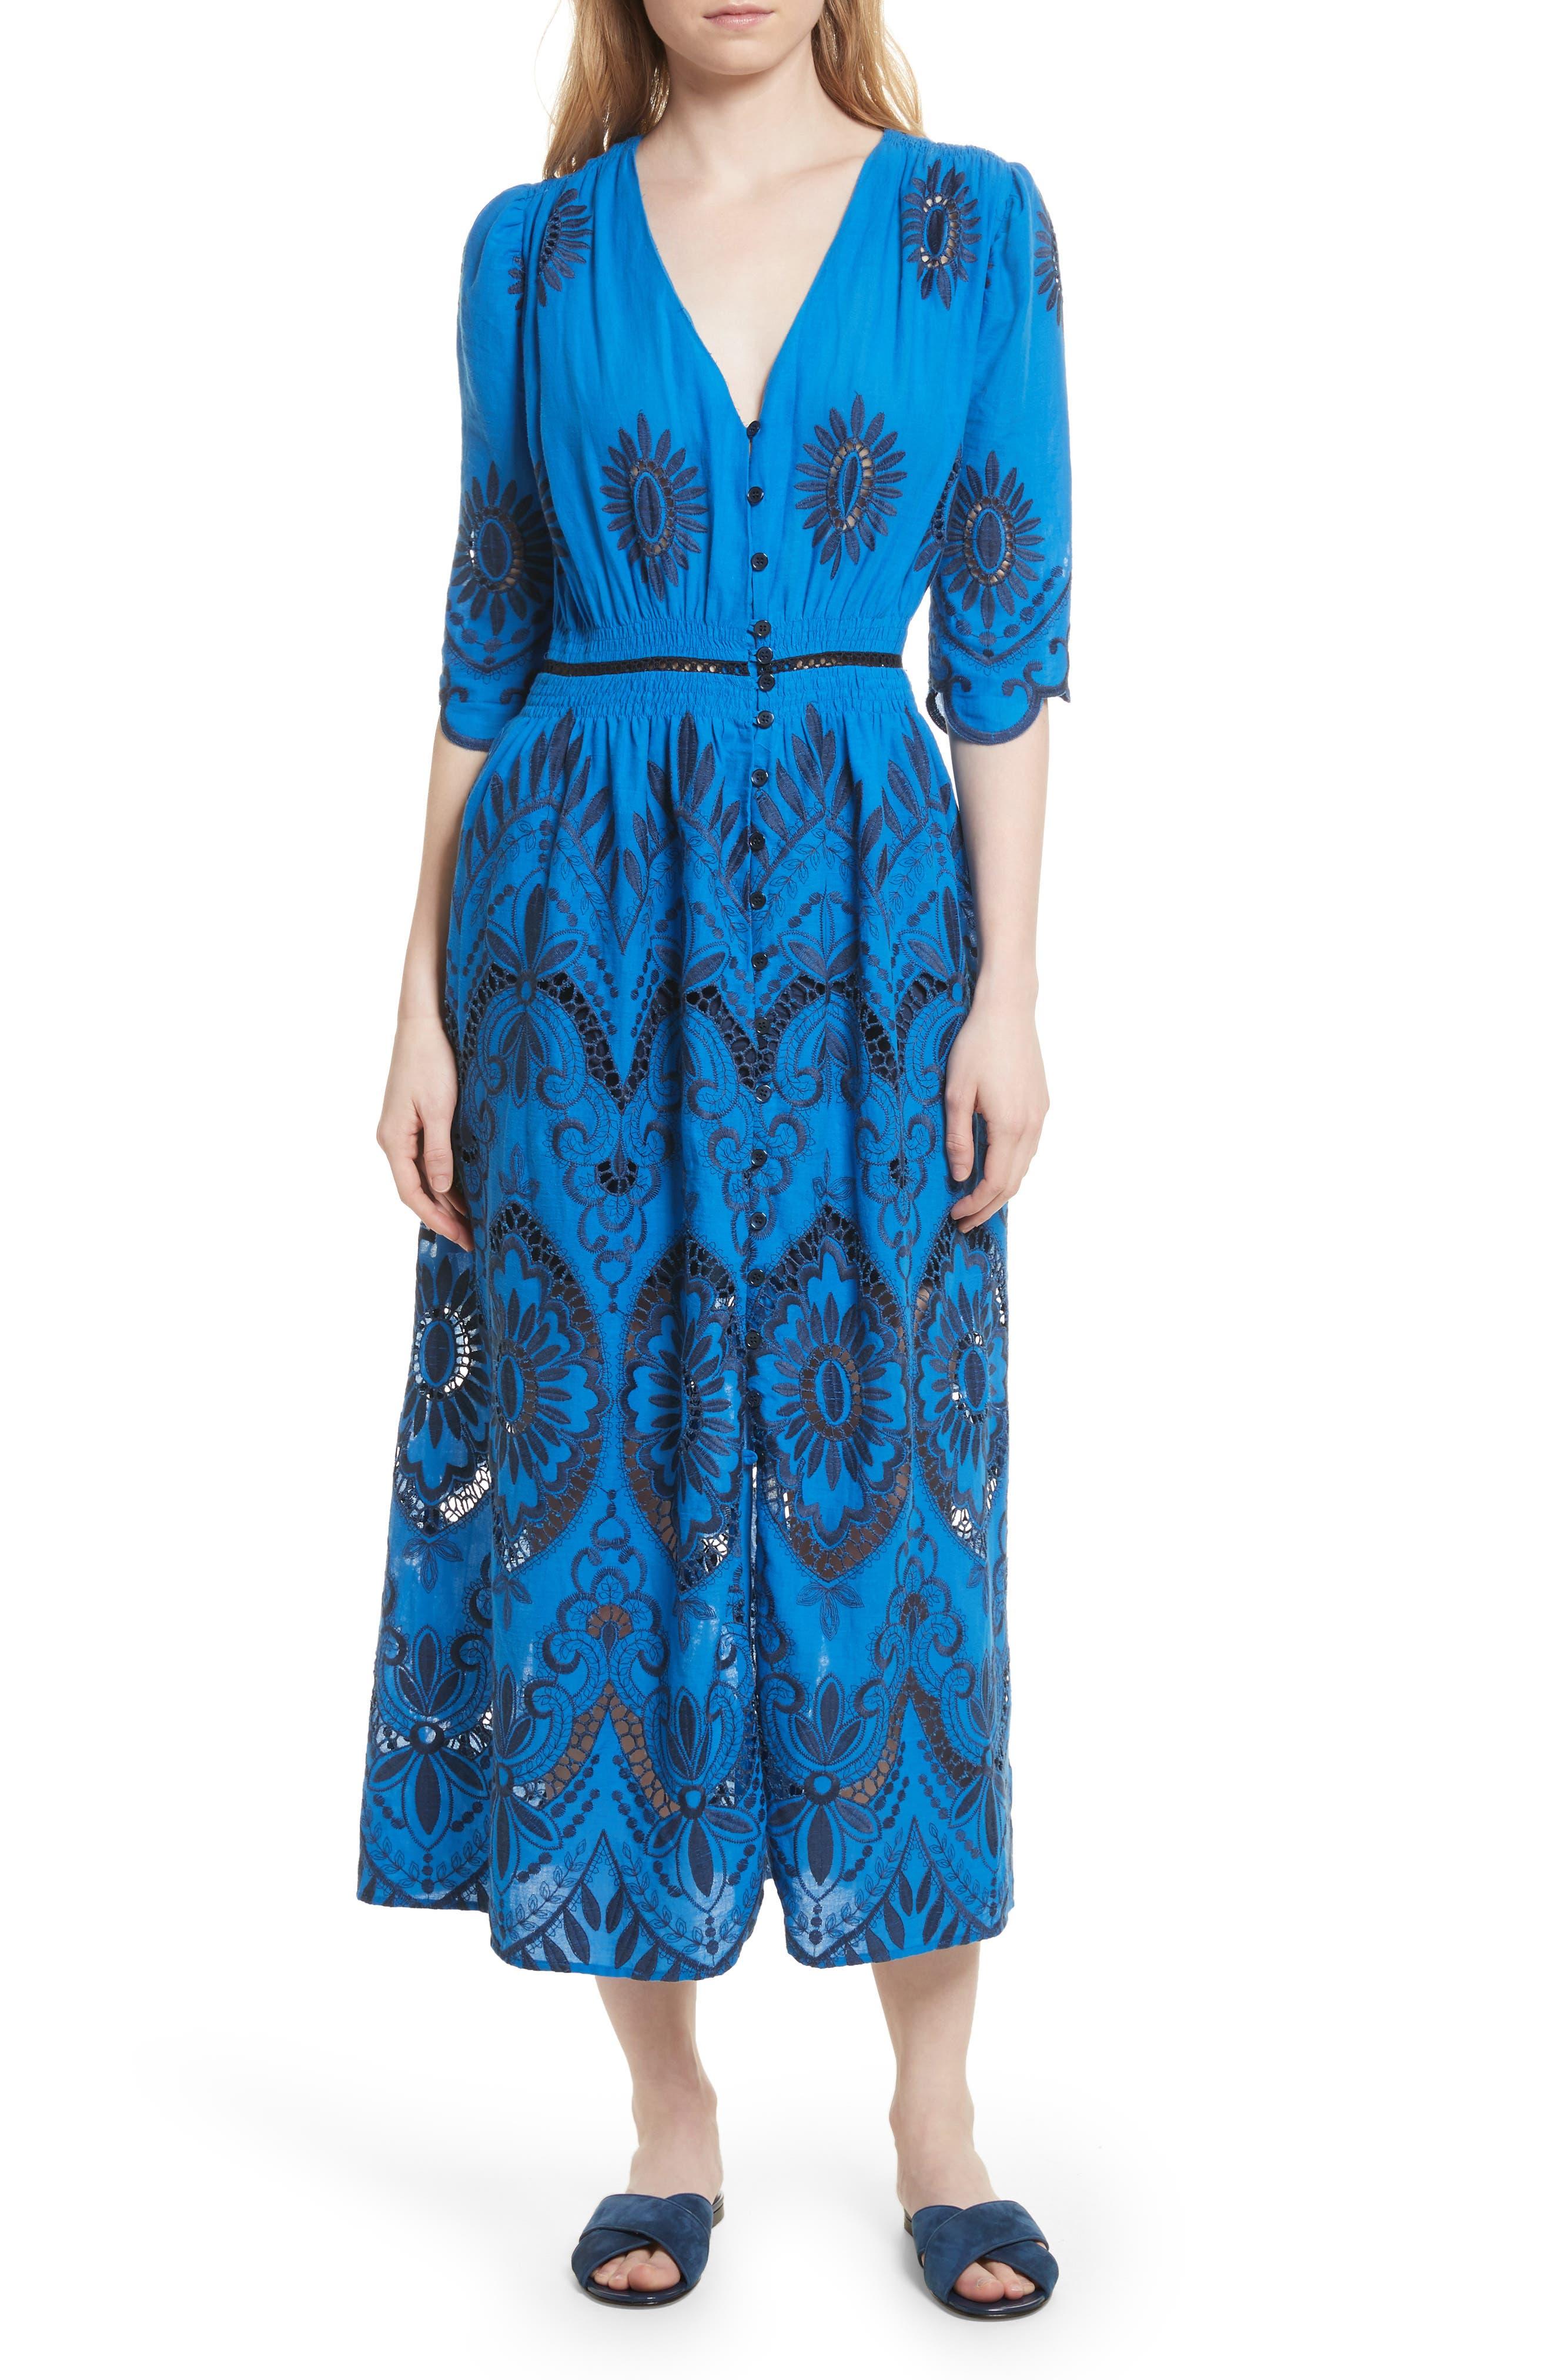 Cotton Eyelet Maxi Dress,                             Main thumbnail 1, color,                             Blue/ Navy